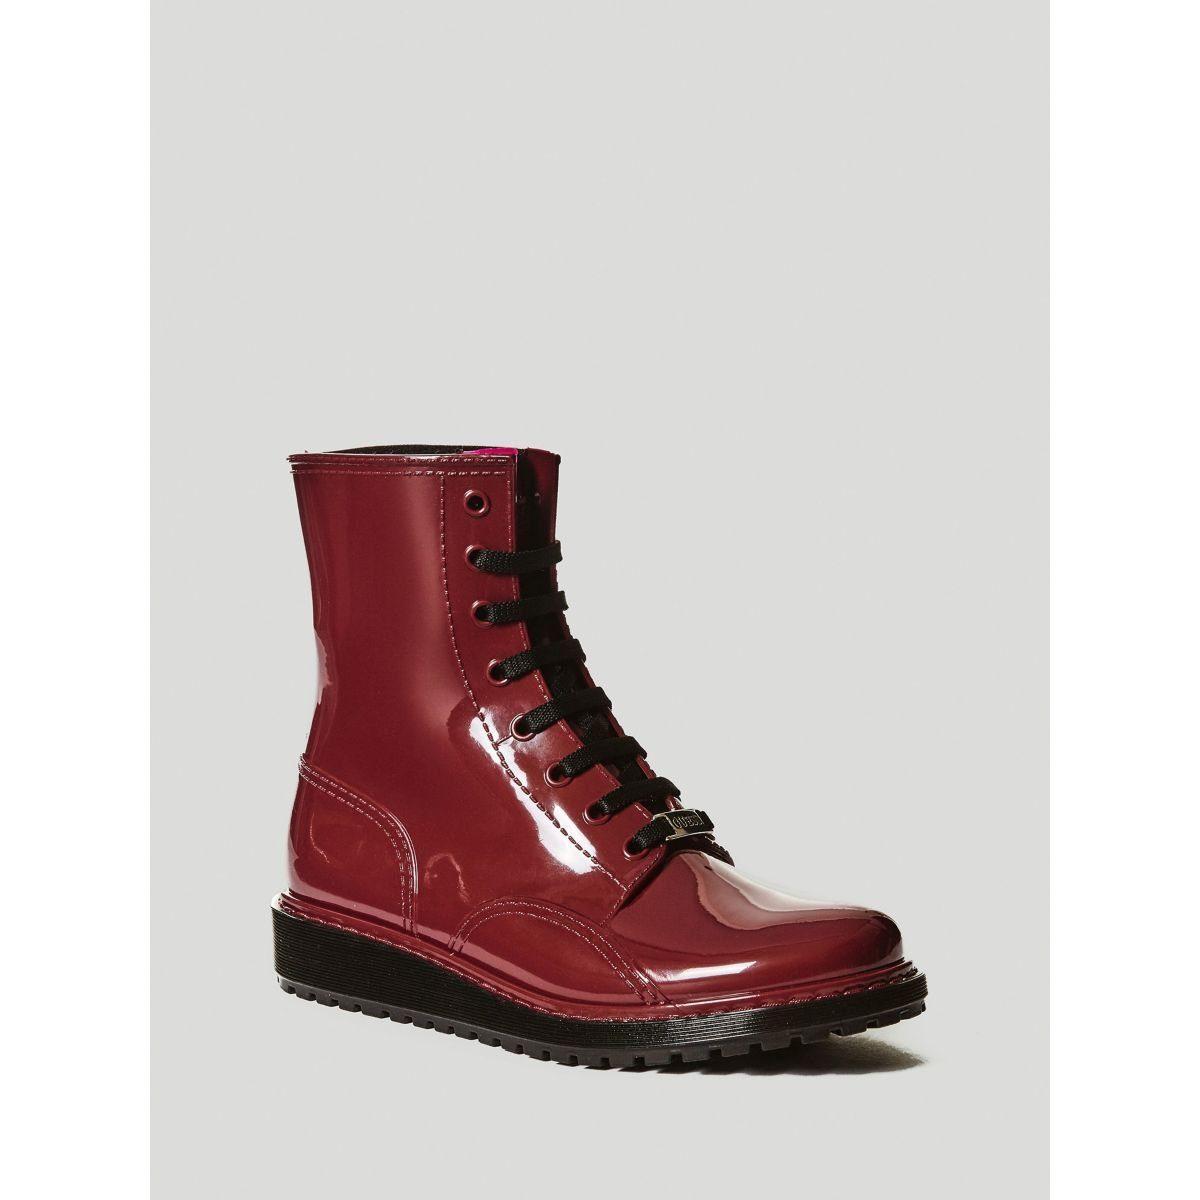 Guess Stiefel online kaufen  rot